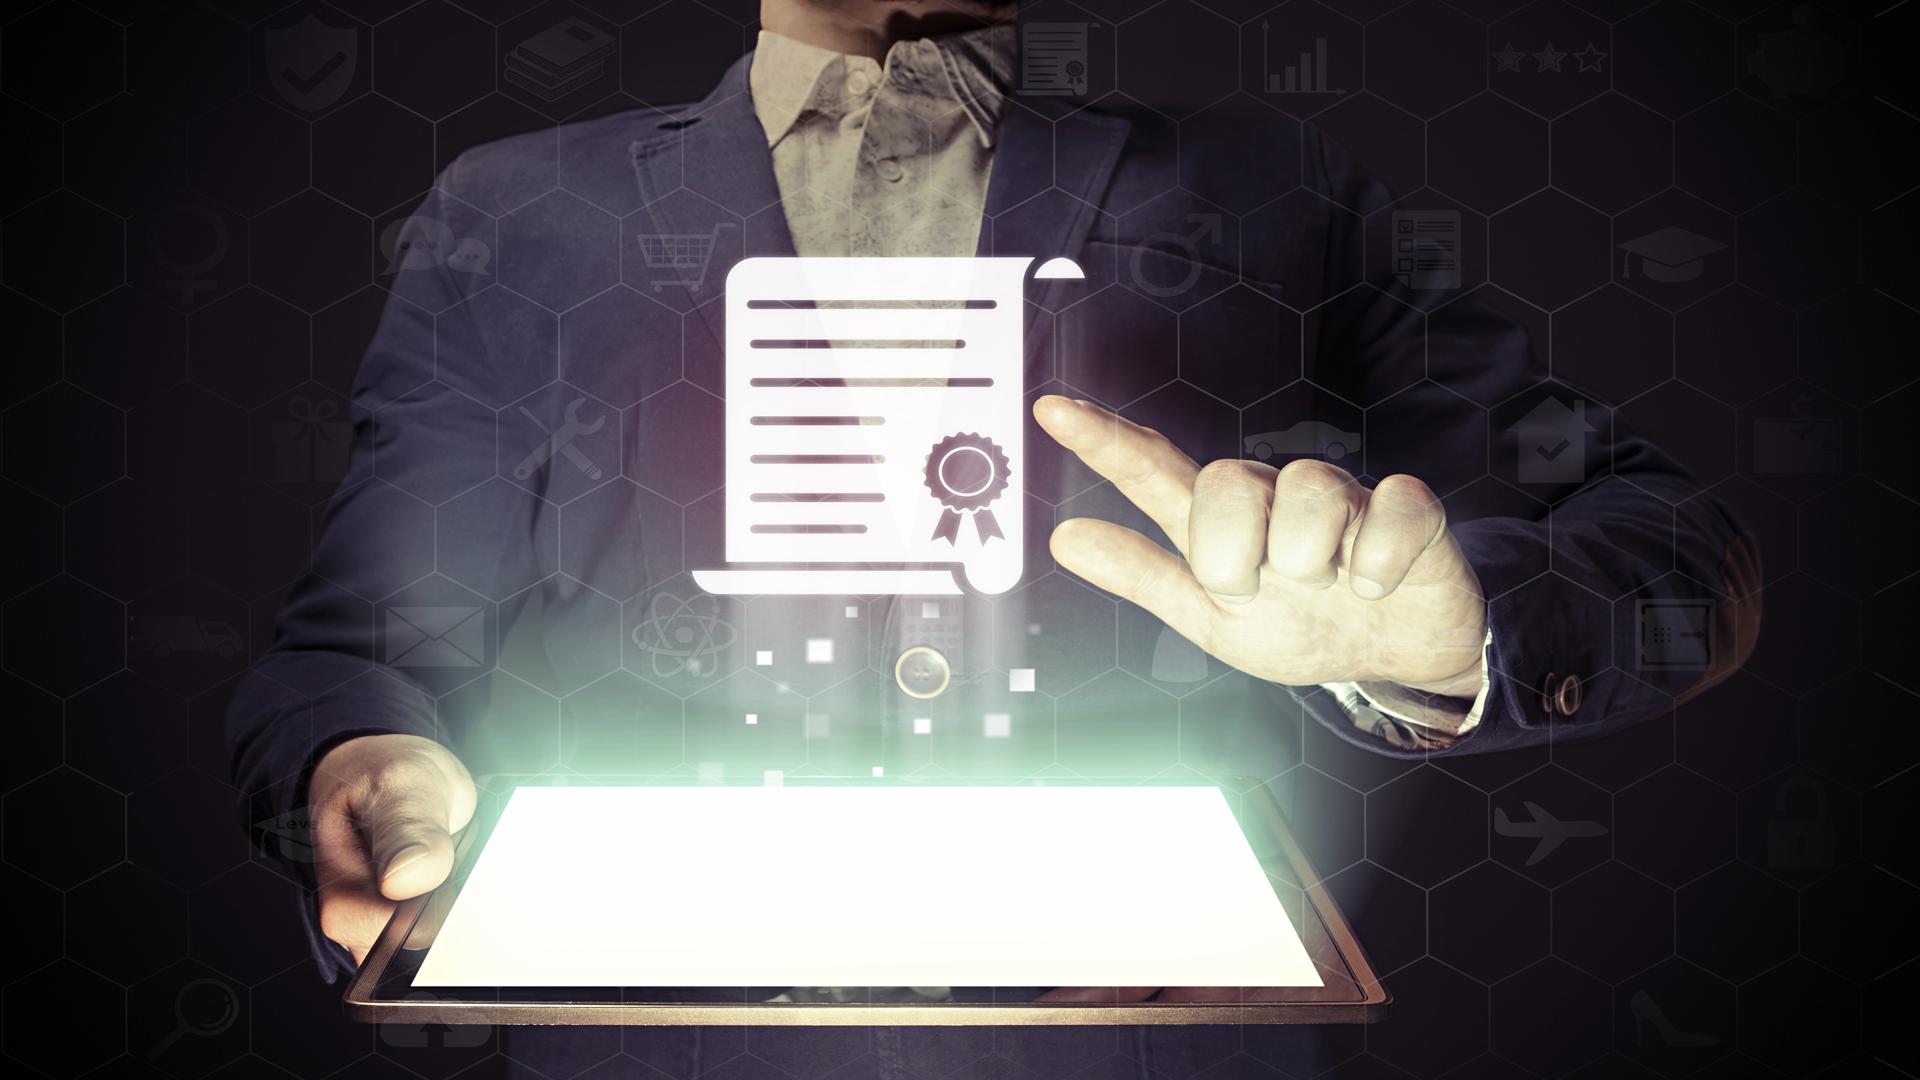 The Elusive Cybersecurity Maturity Model Certification